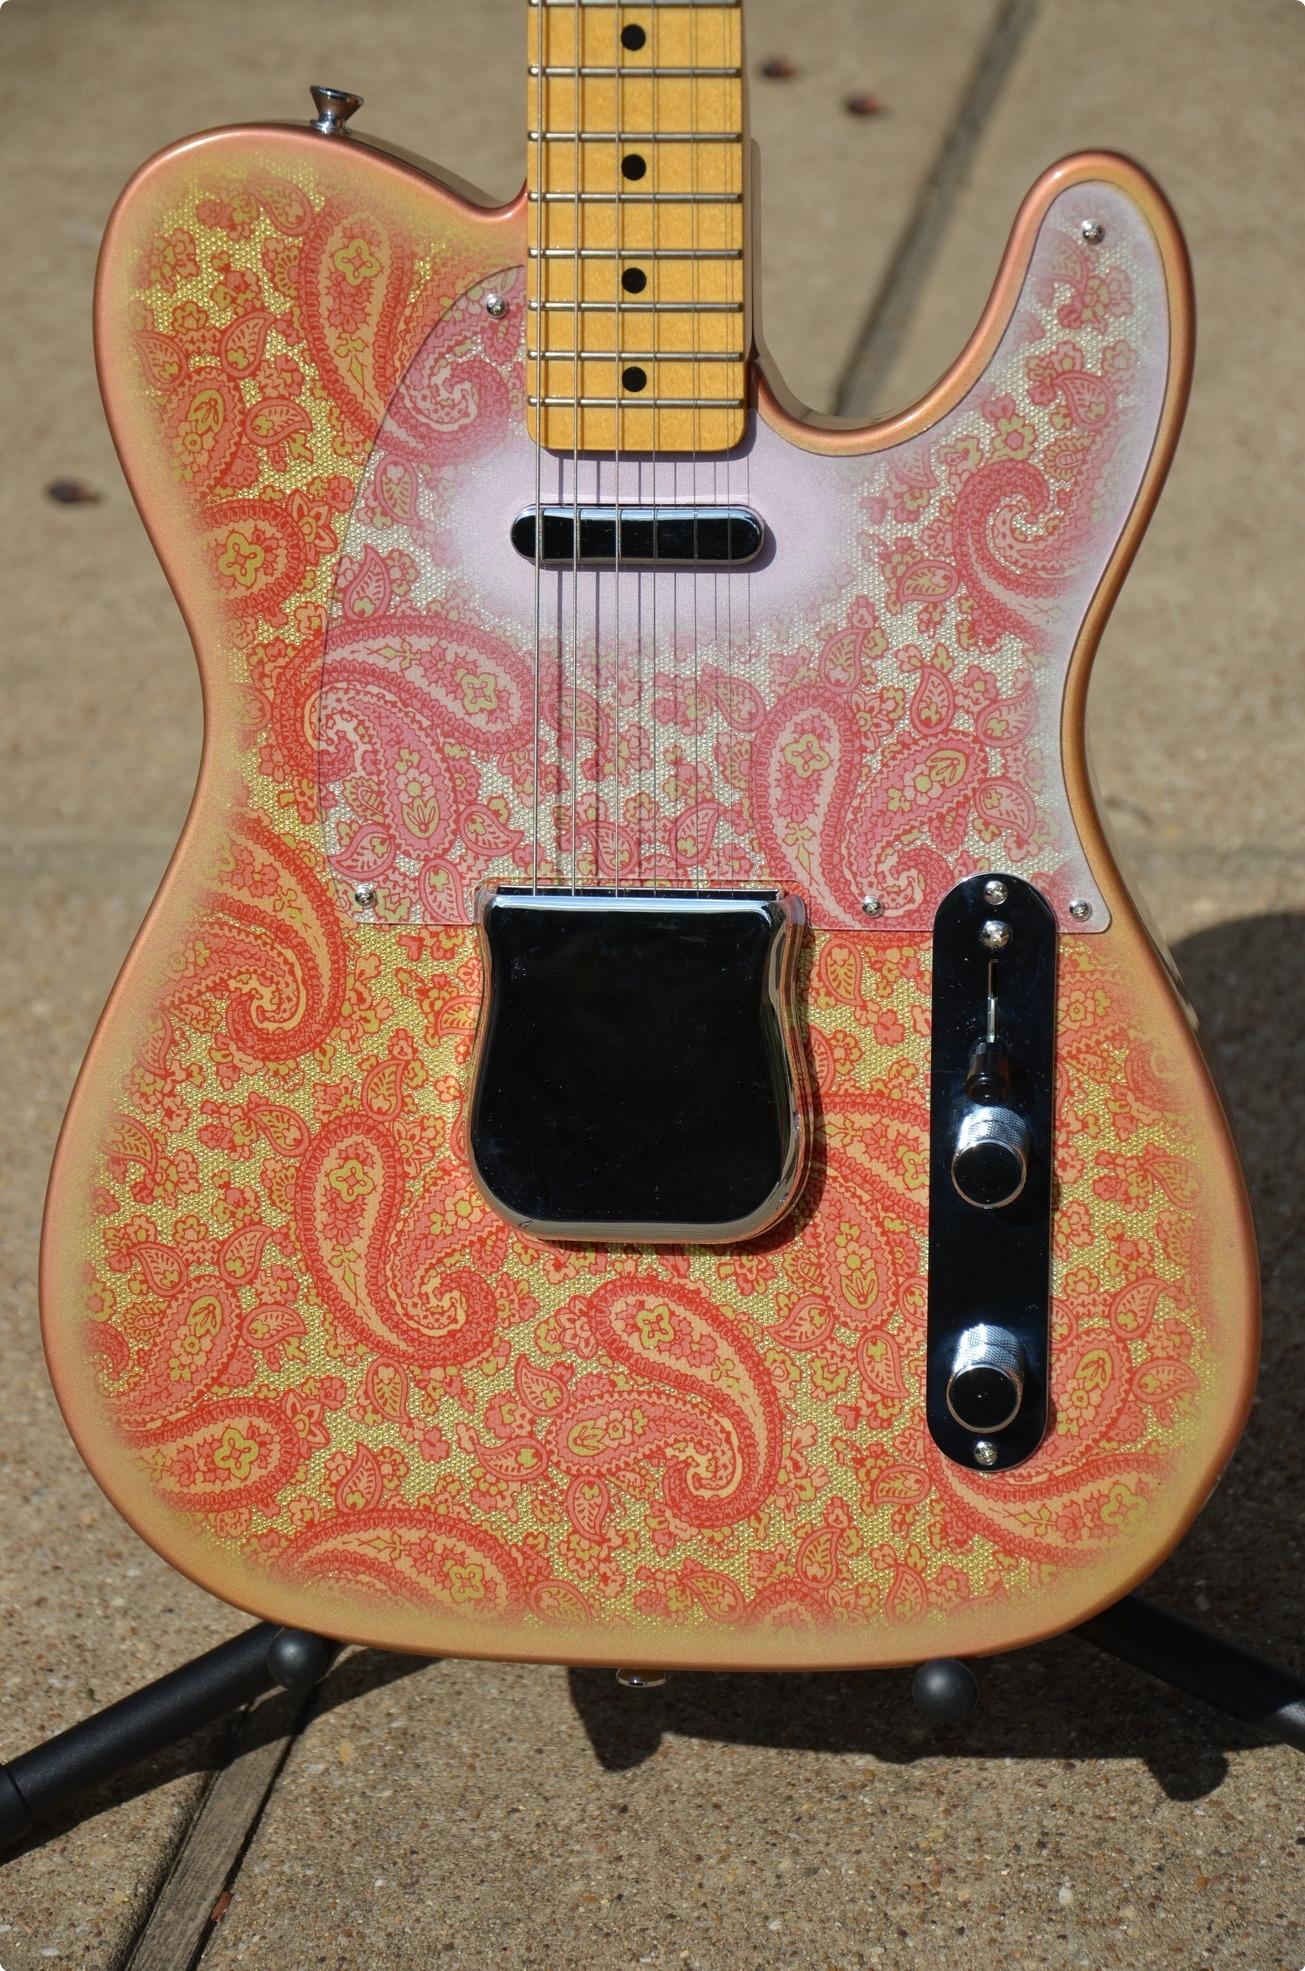 Keller Guitars 1968 Pink Paisley Telecaster 2016 Nitro